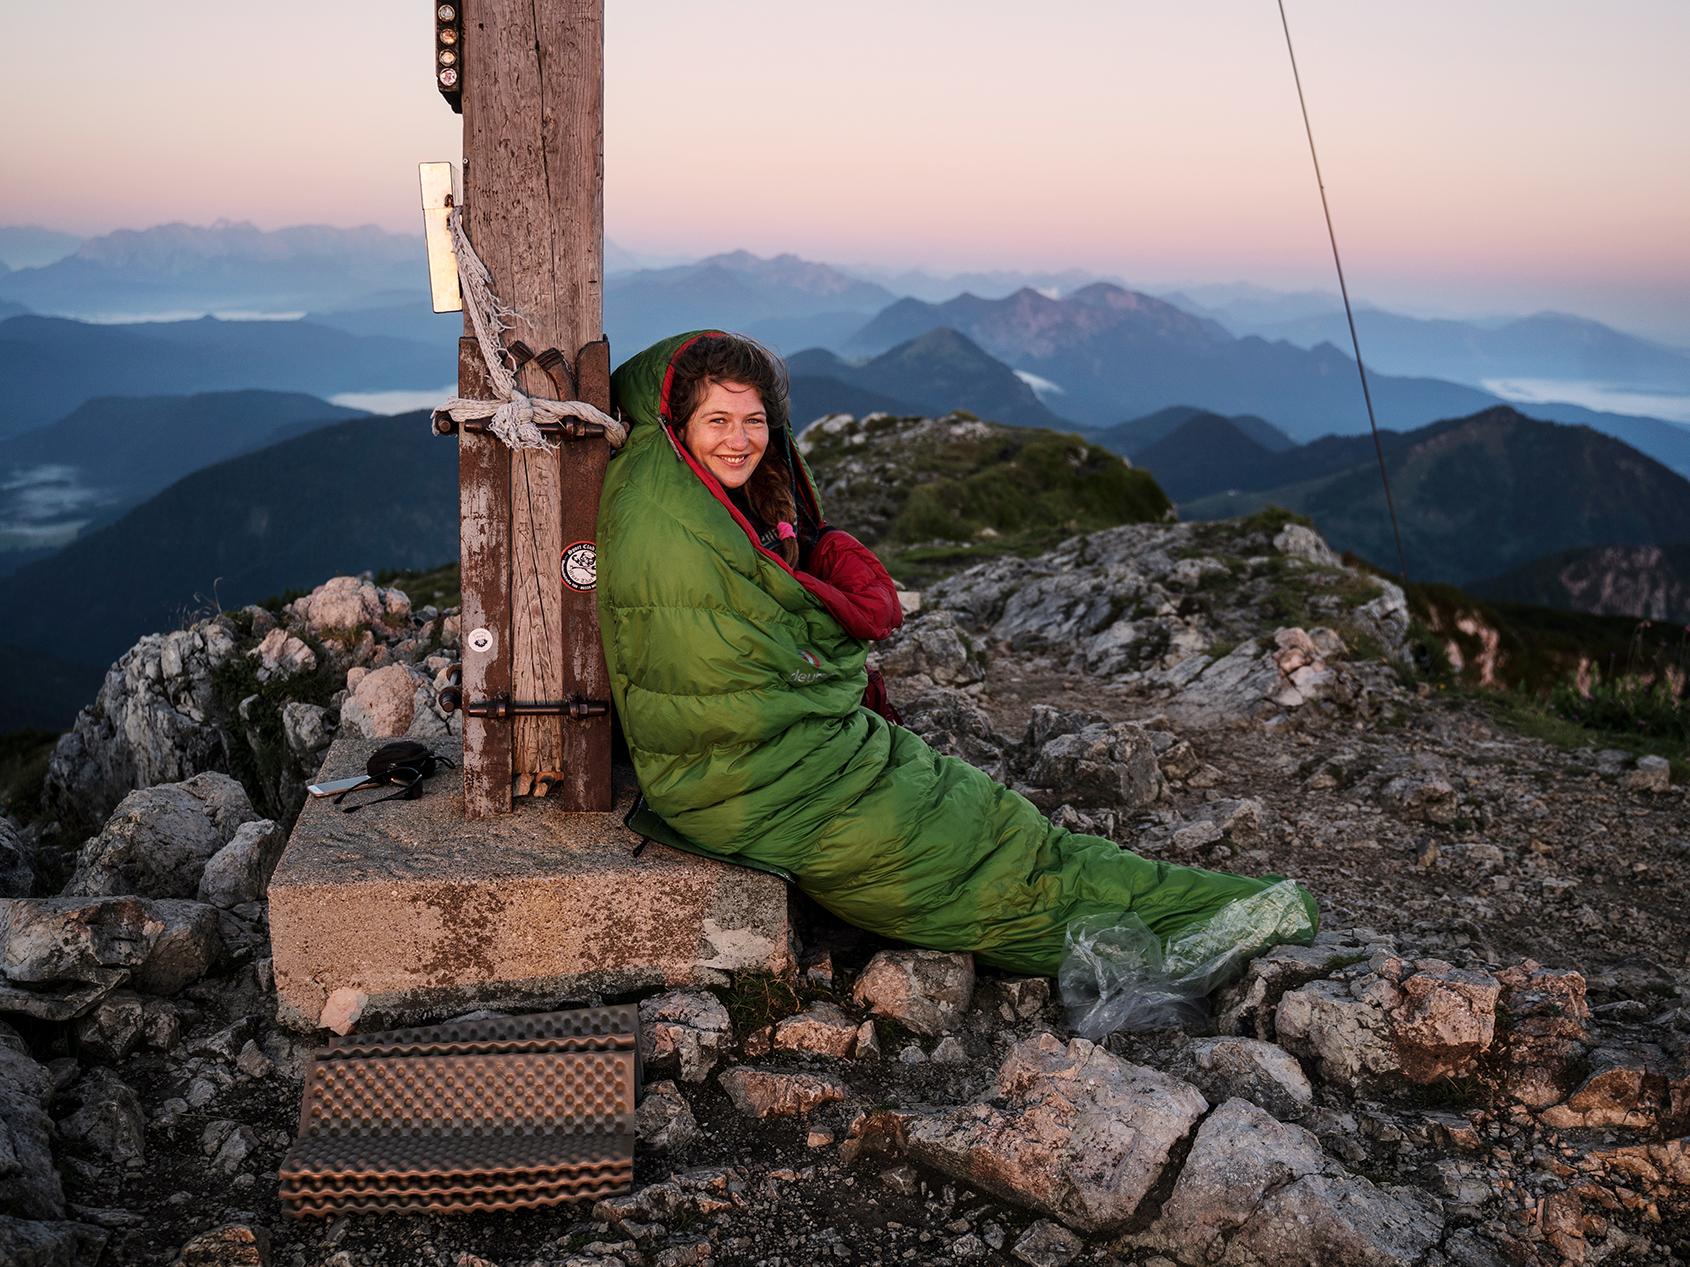 A hiker in her sleeping bag enjoying the peak views at sunrise.